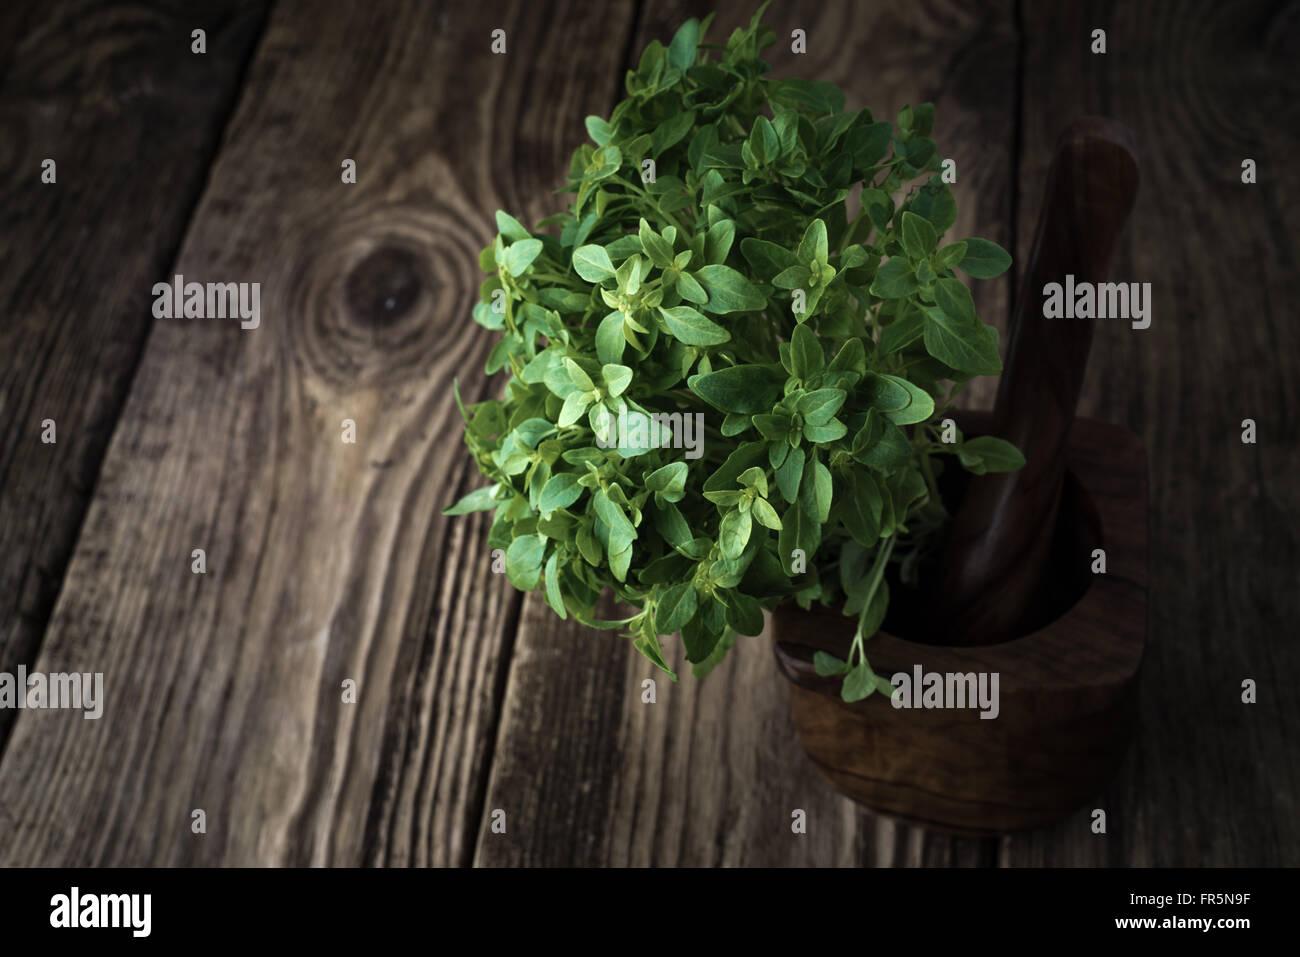 Basil and mortar on old boards horizontal - Stock Image